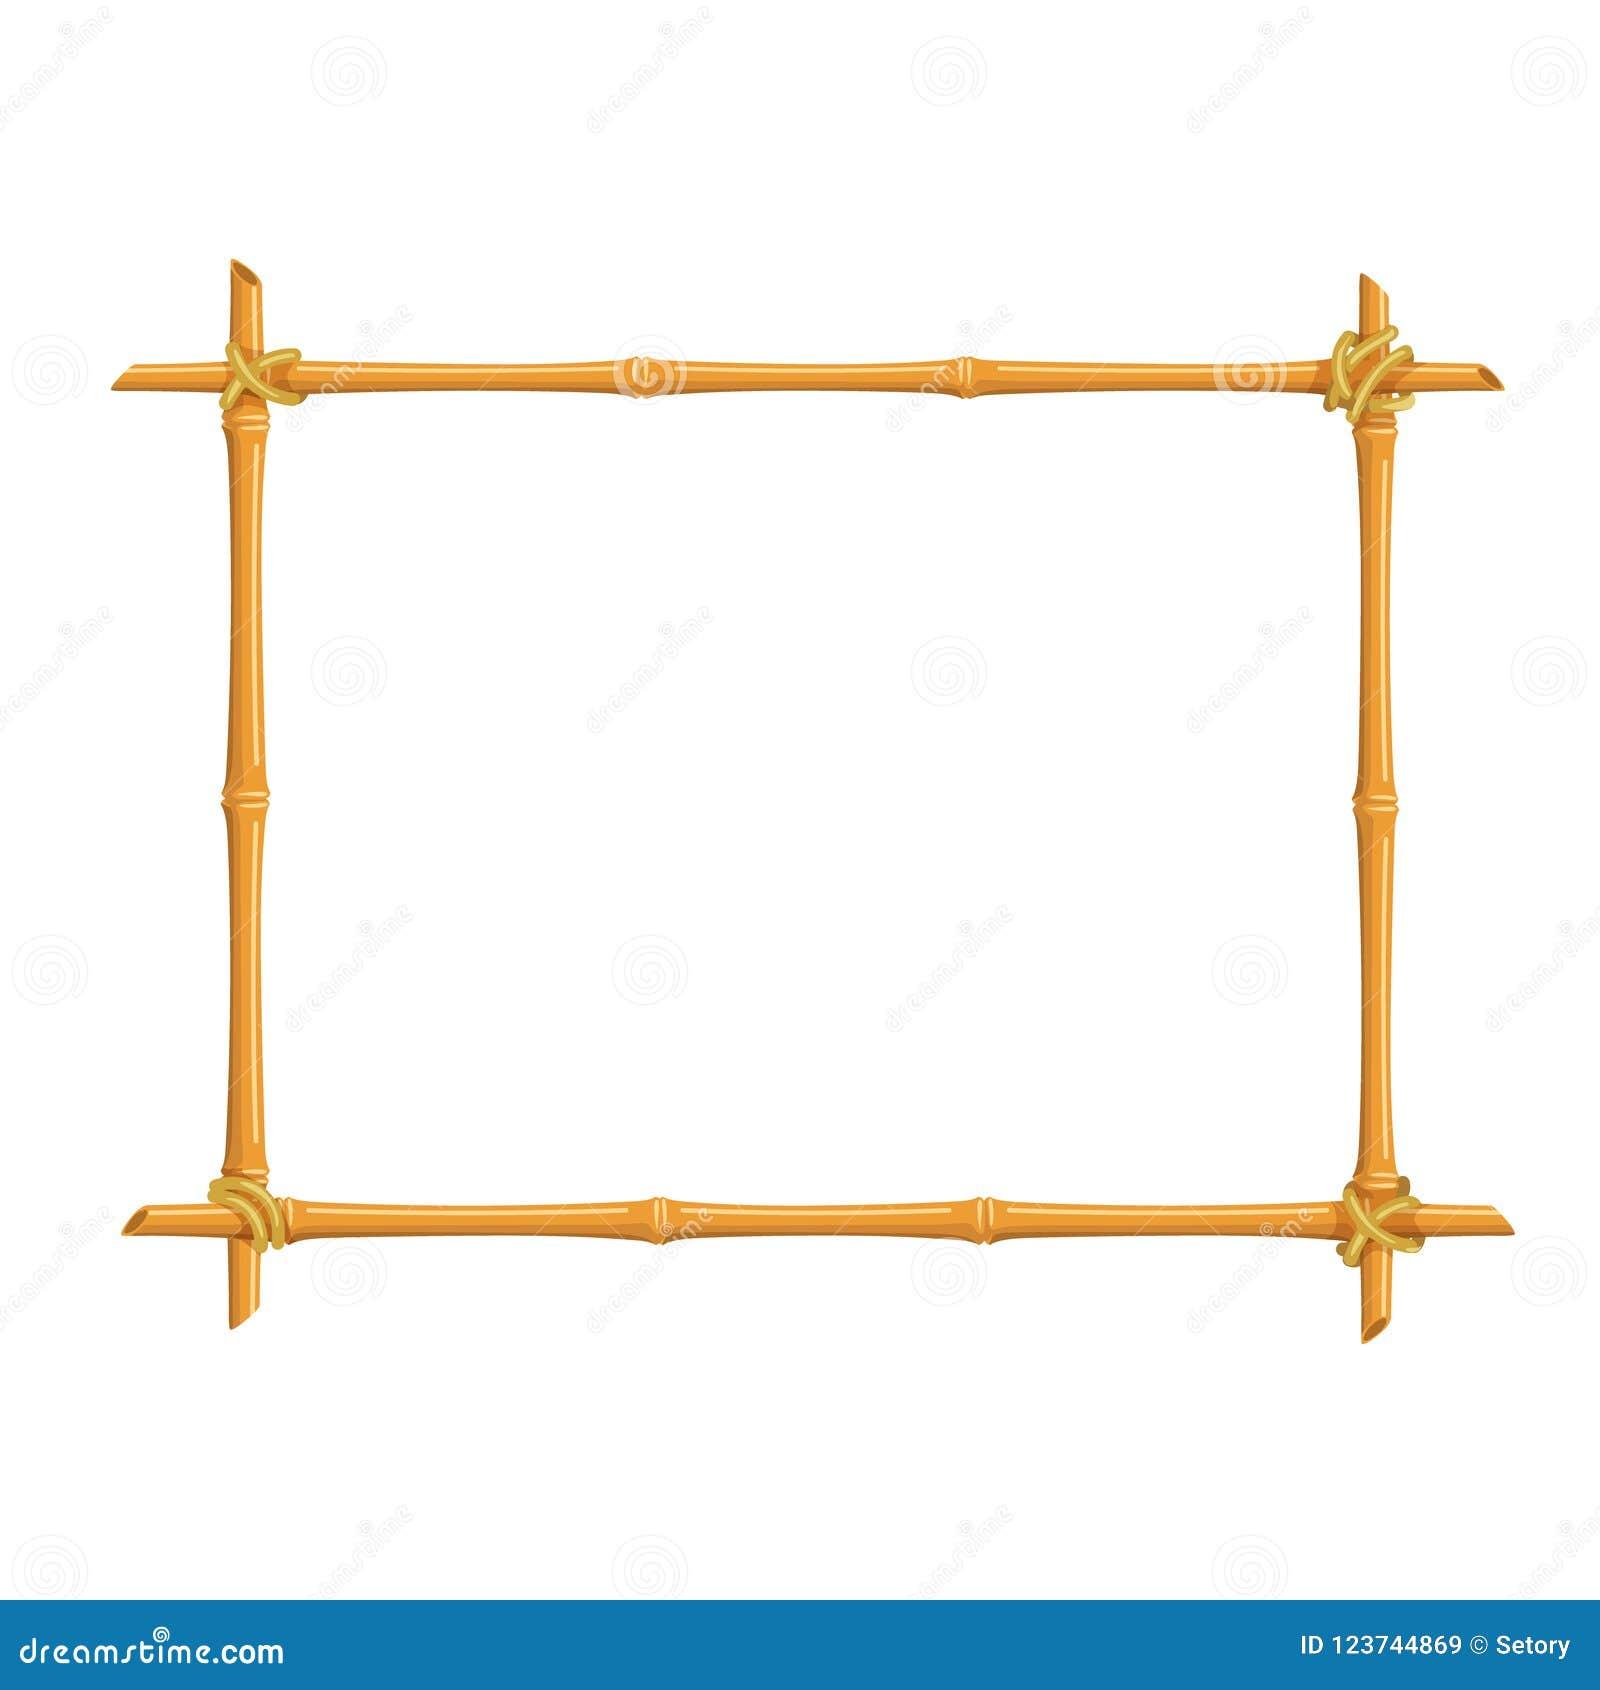 Bamboo signboard frame